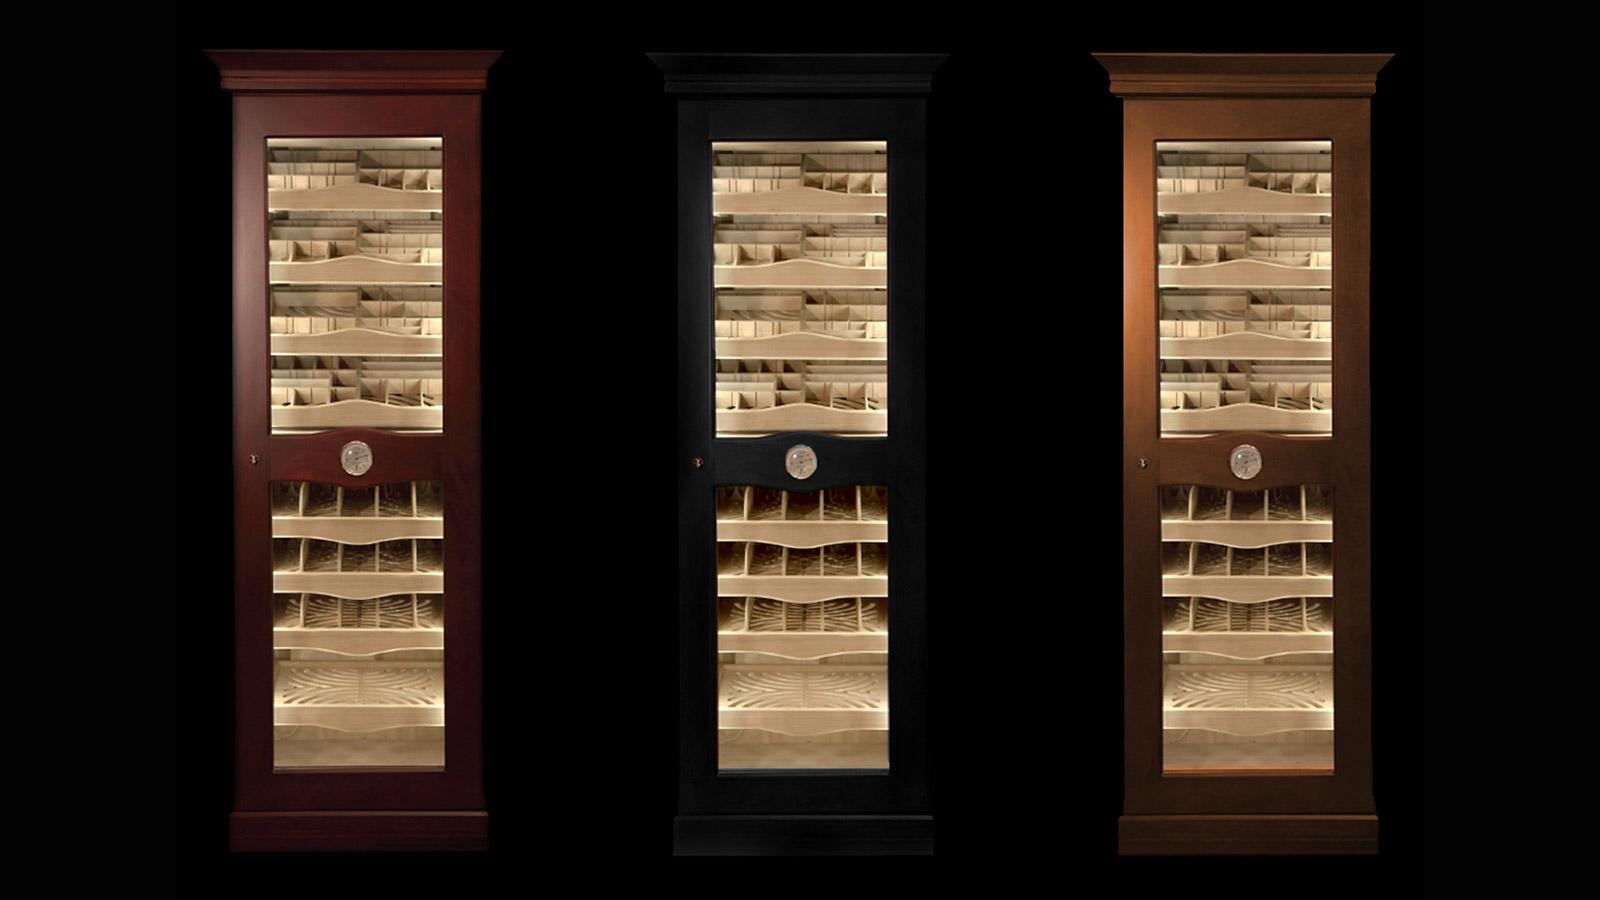 the_best_luxury_humidors_for_your_superyacht_maklary-humidor-cigarmonkeys.jpg